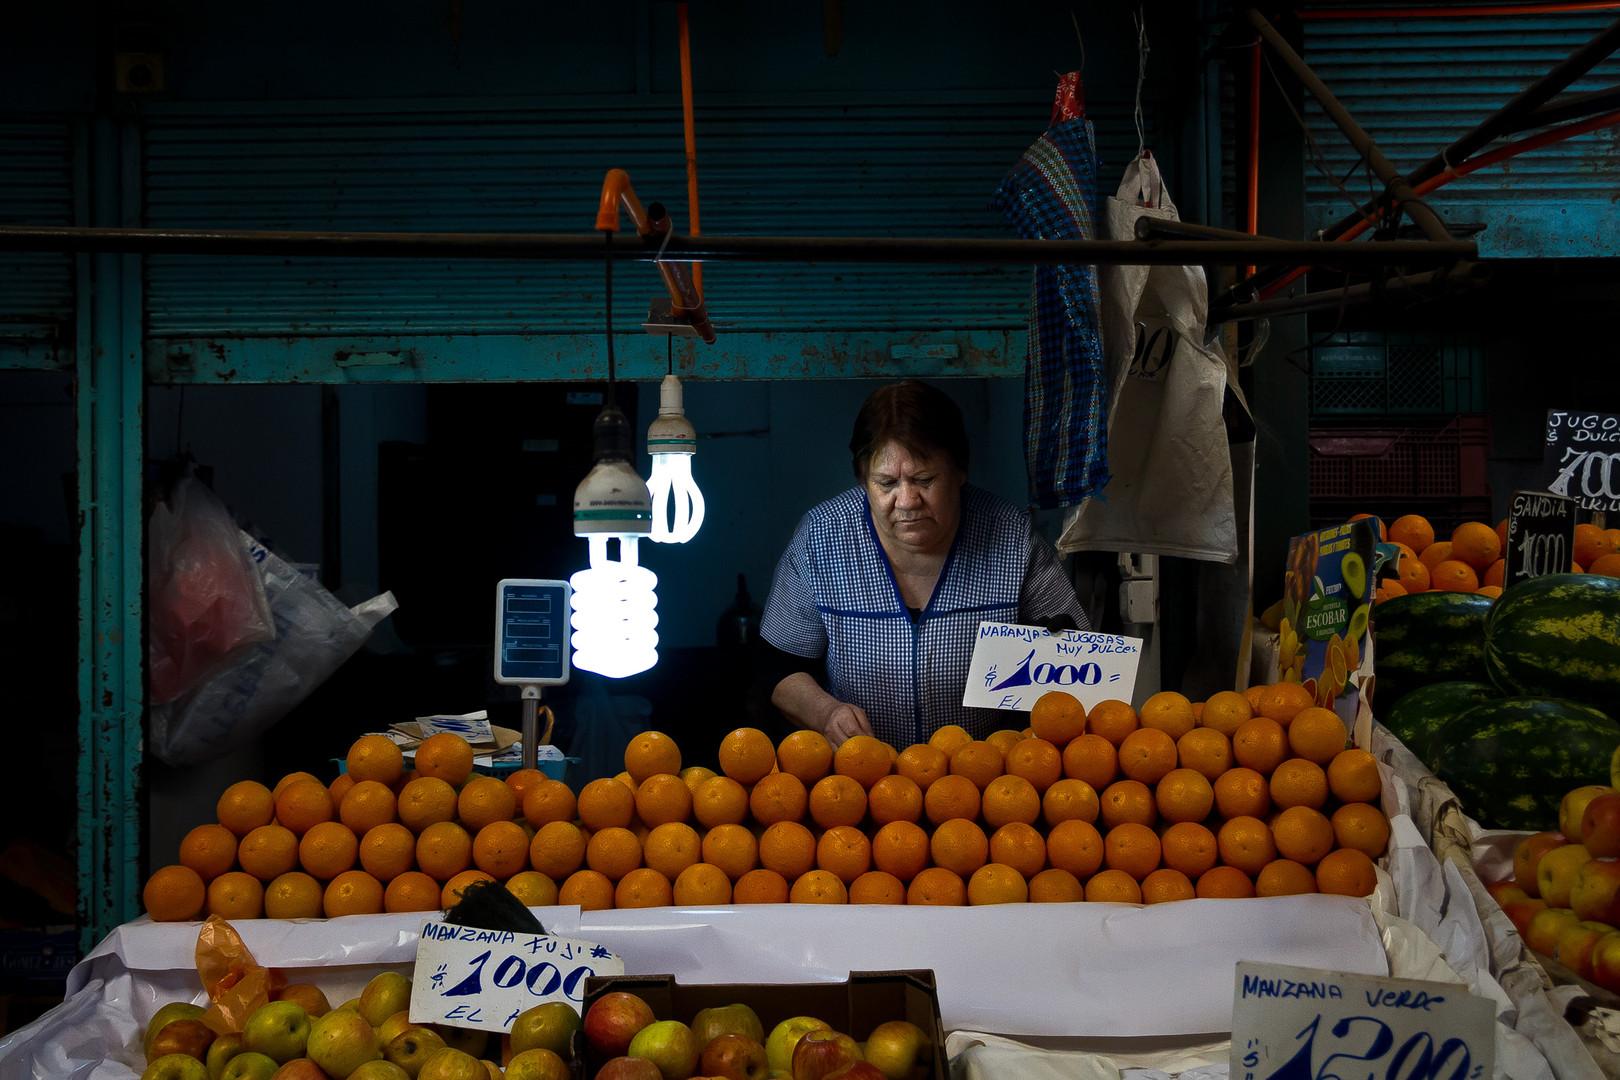 La vendedora de naranjas